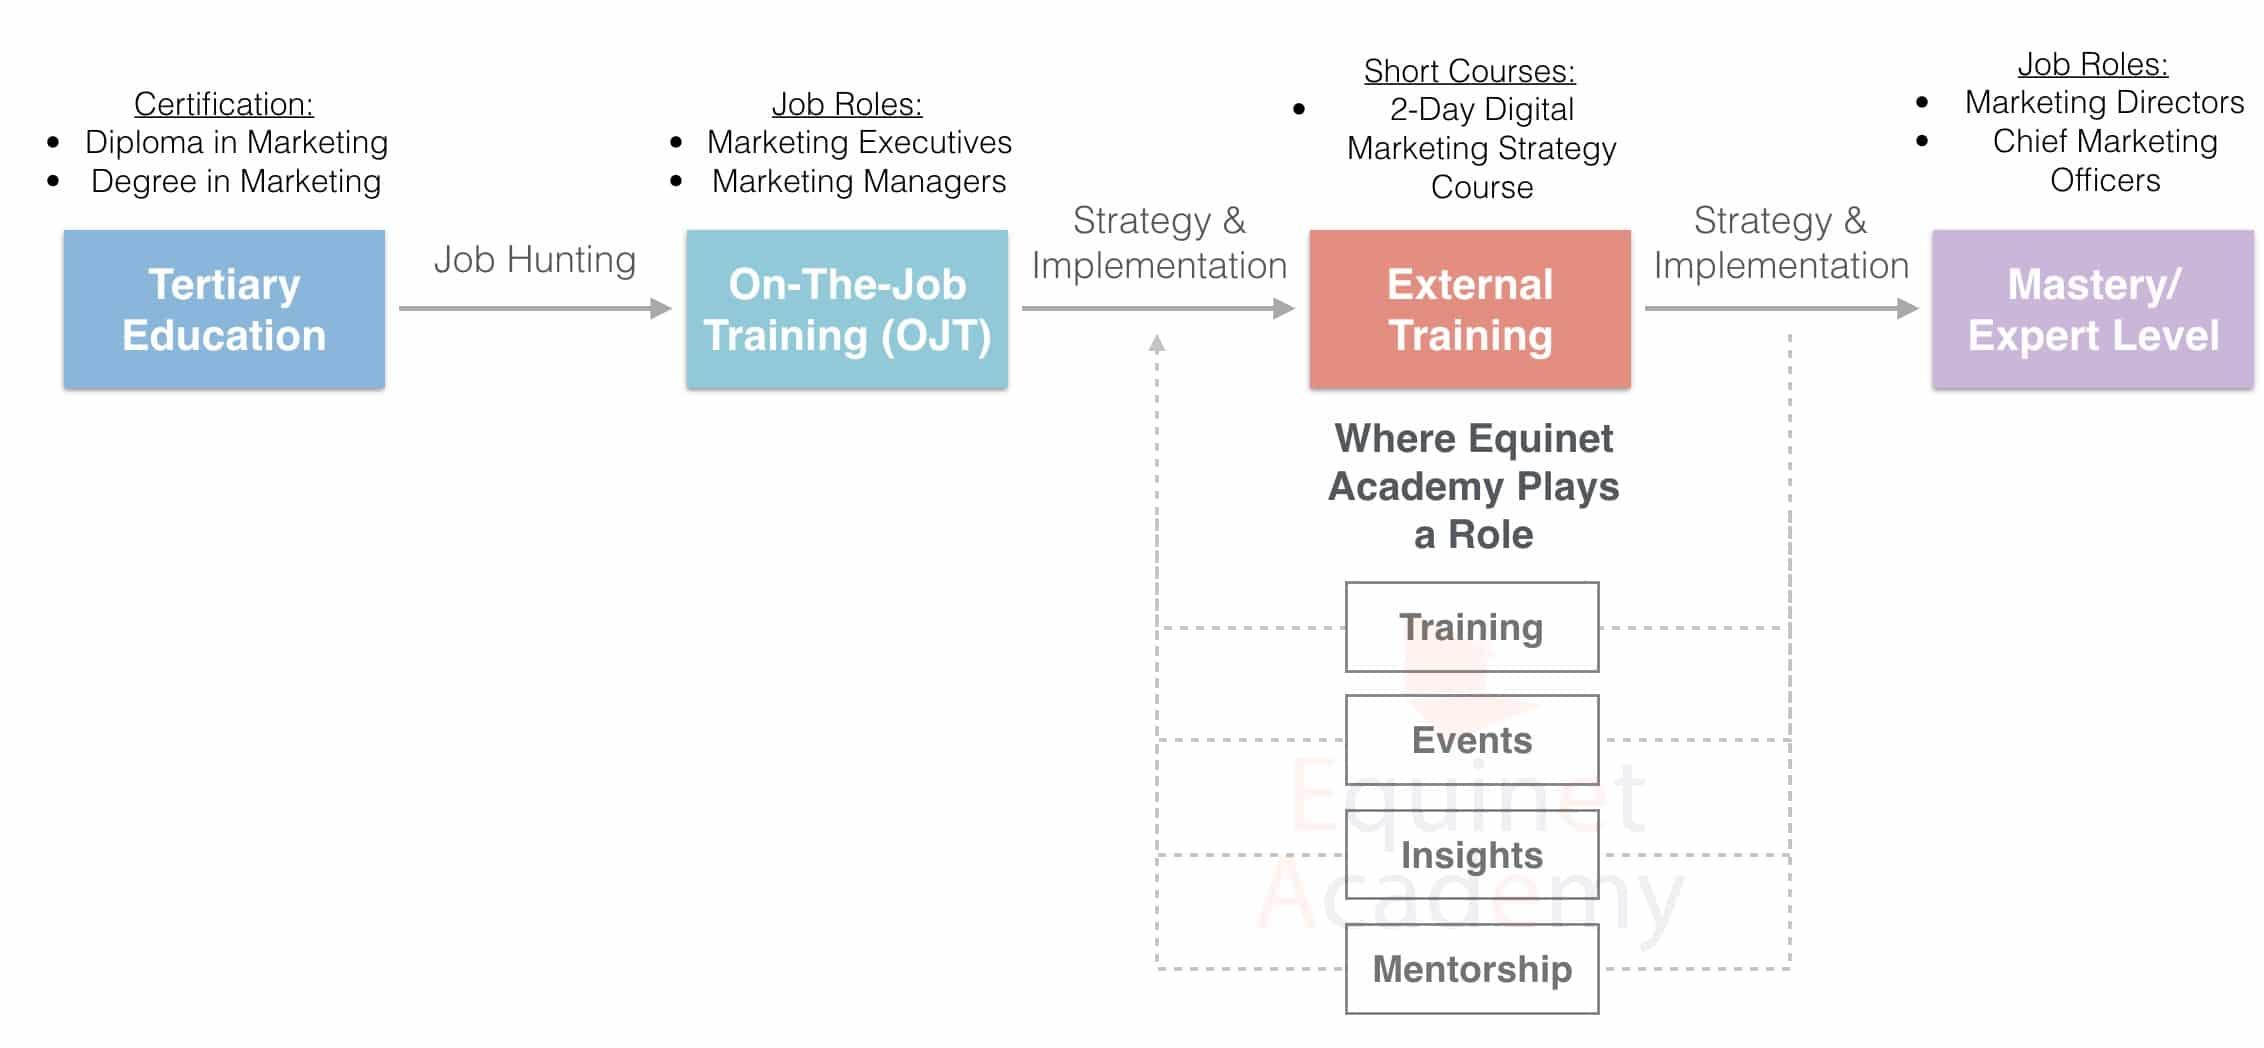 Digital Marketing Career Progression Pathway